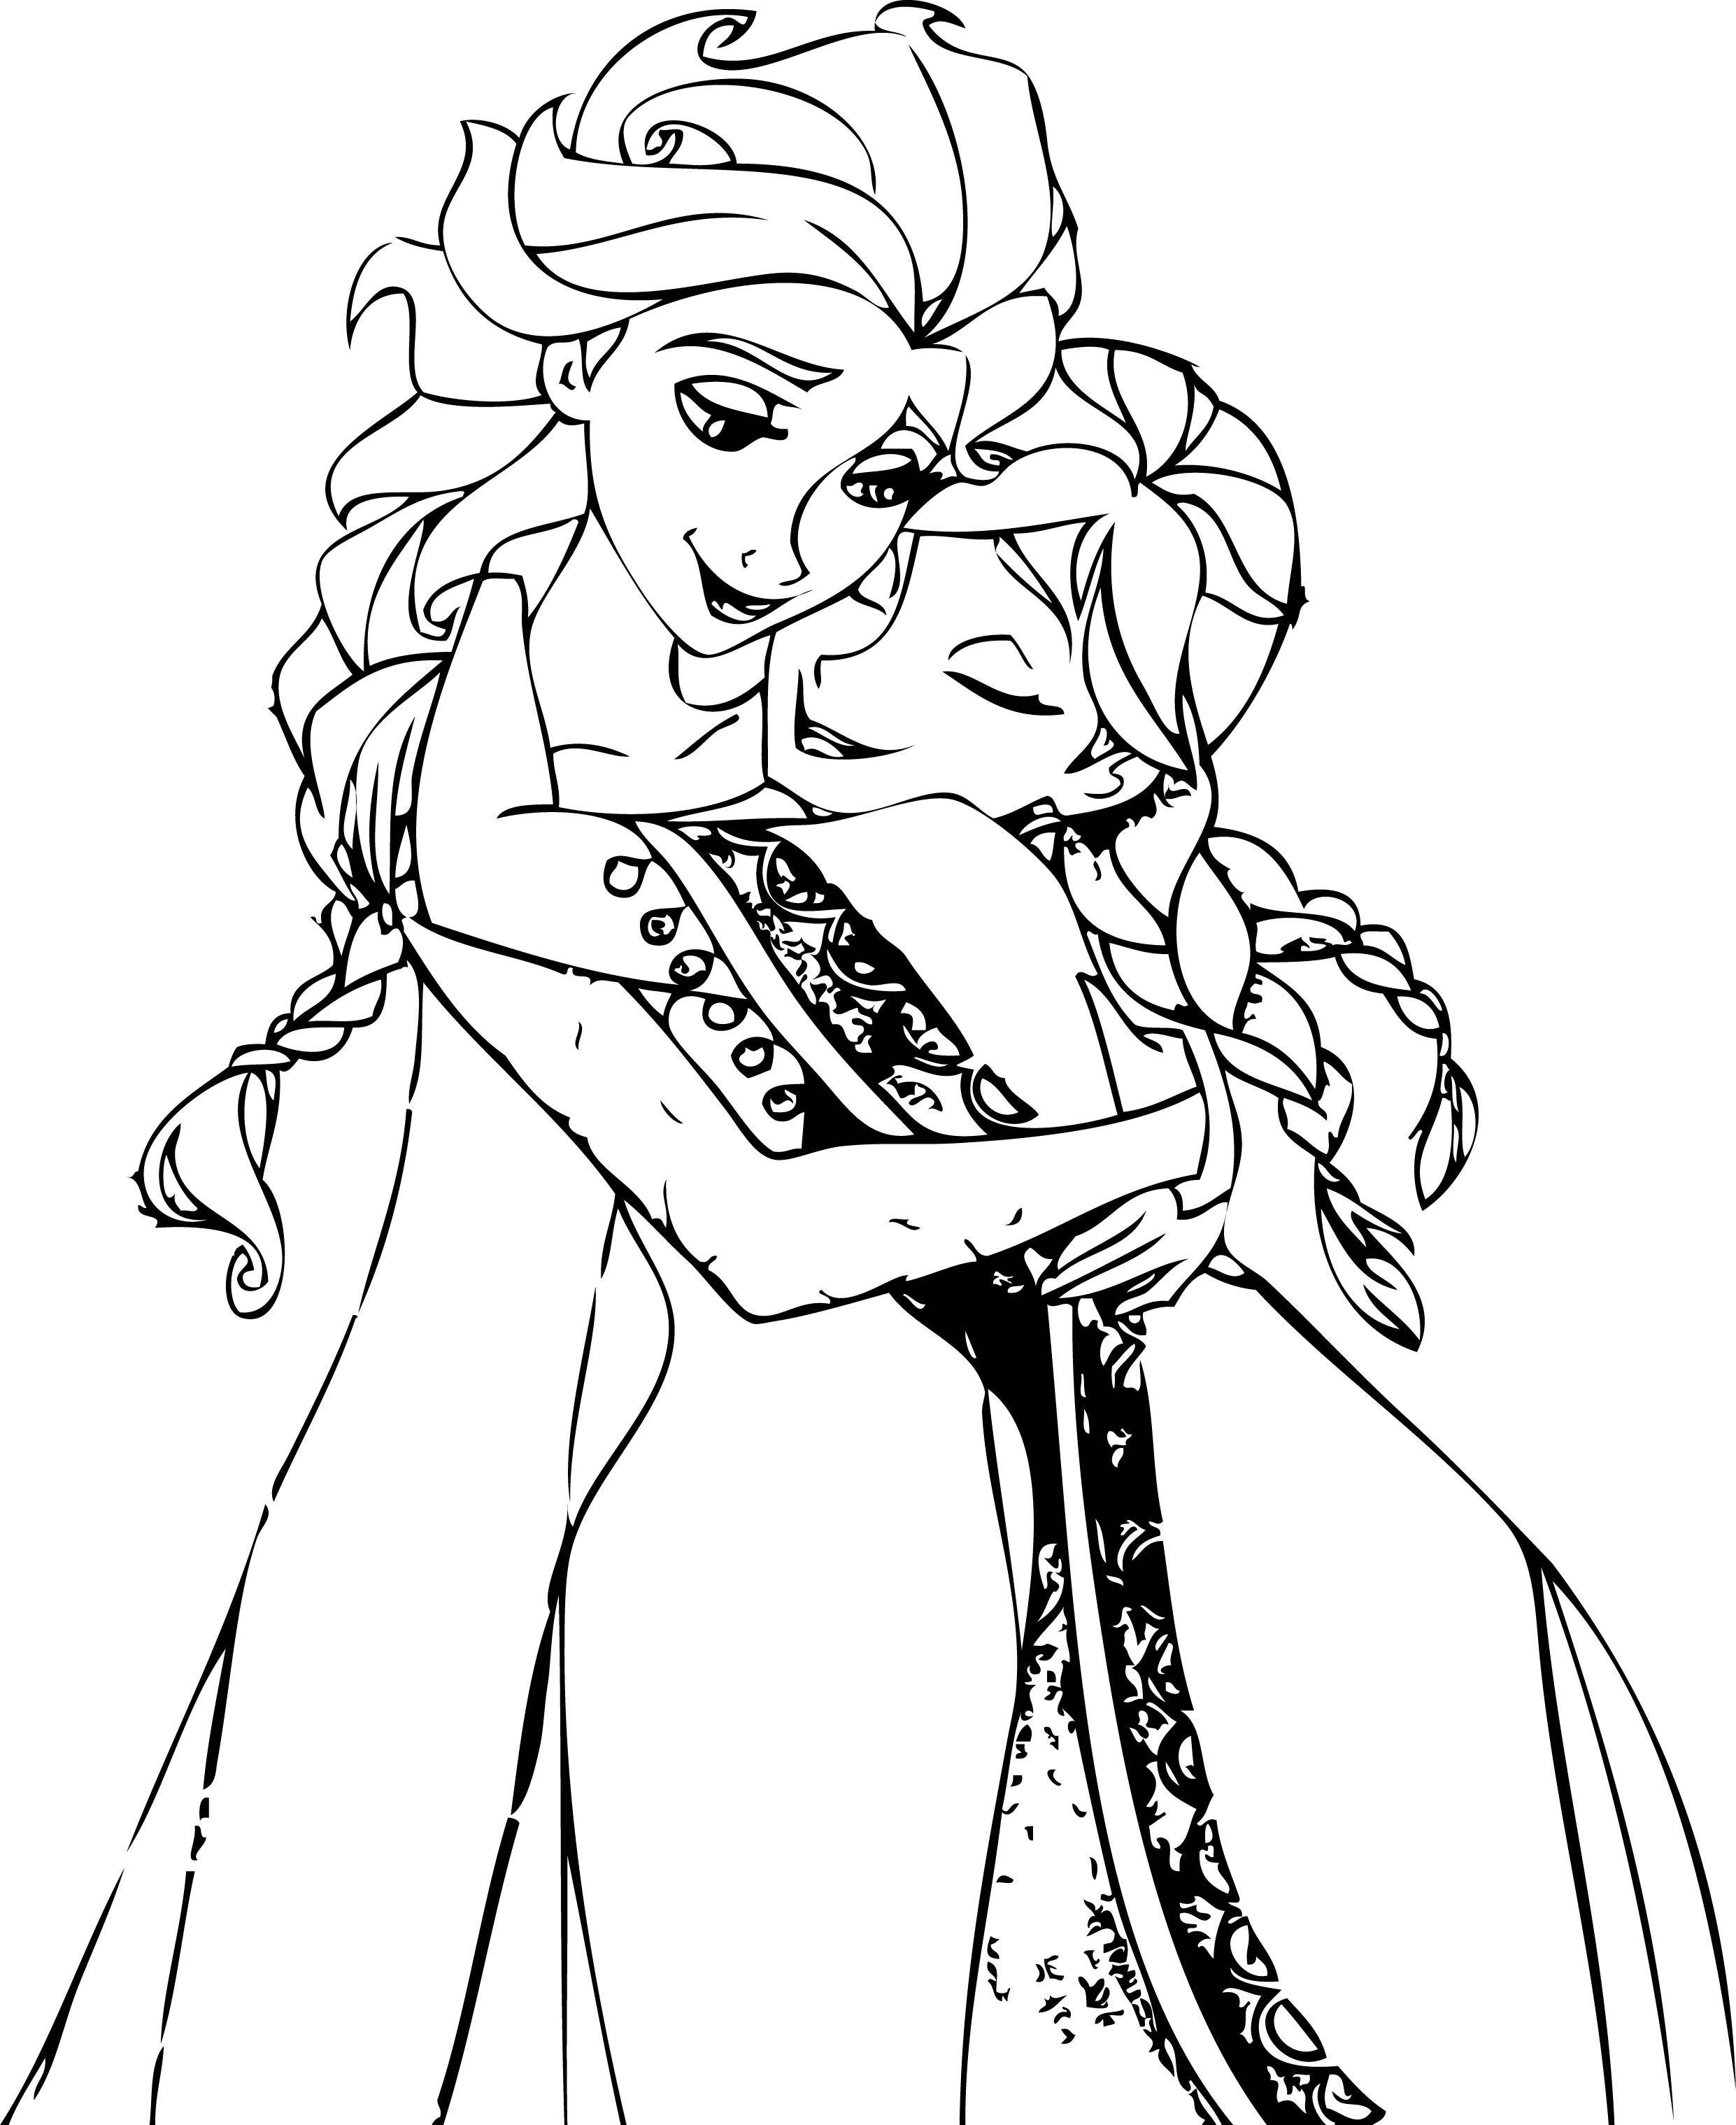 Elsa And Anna Hug Coloring Page